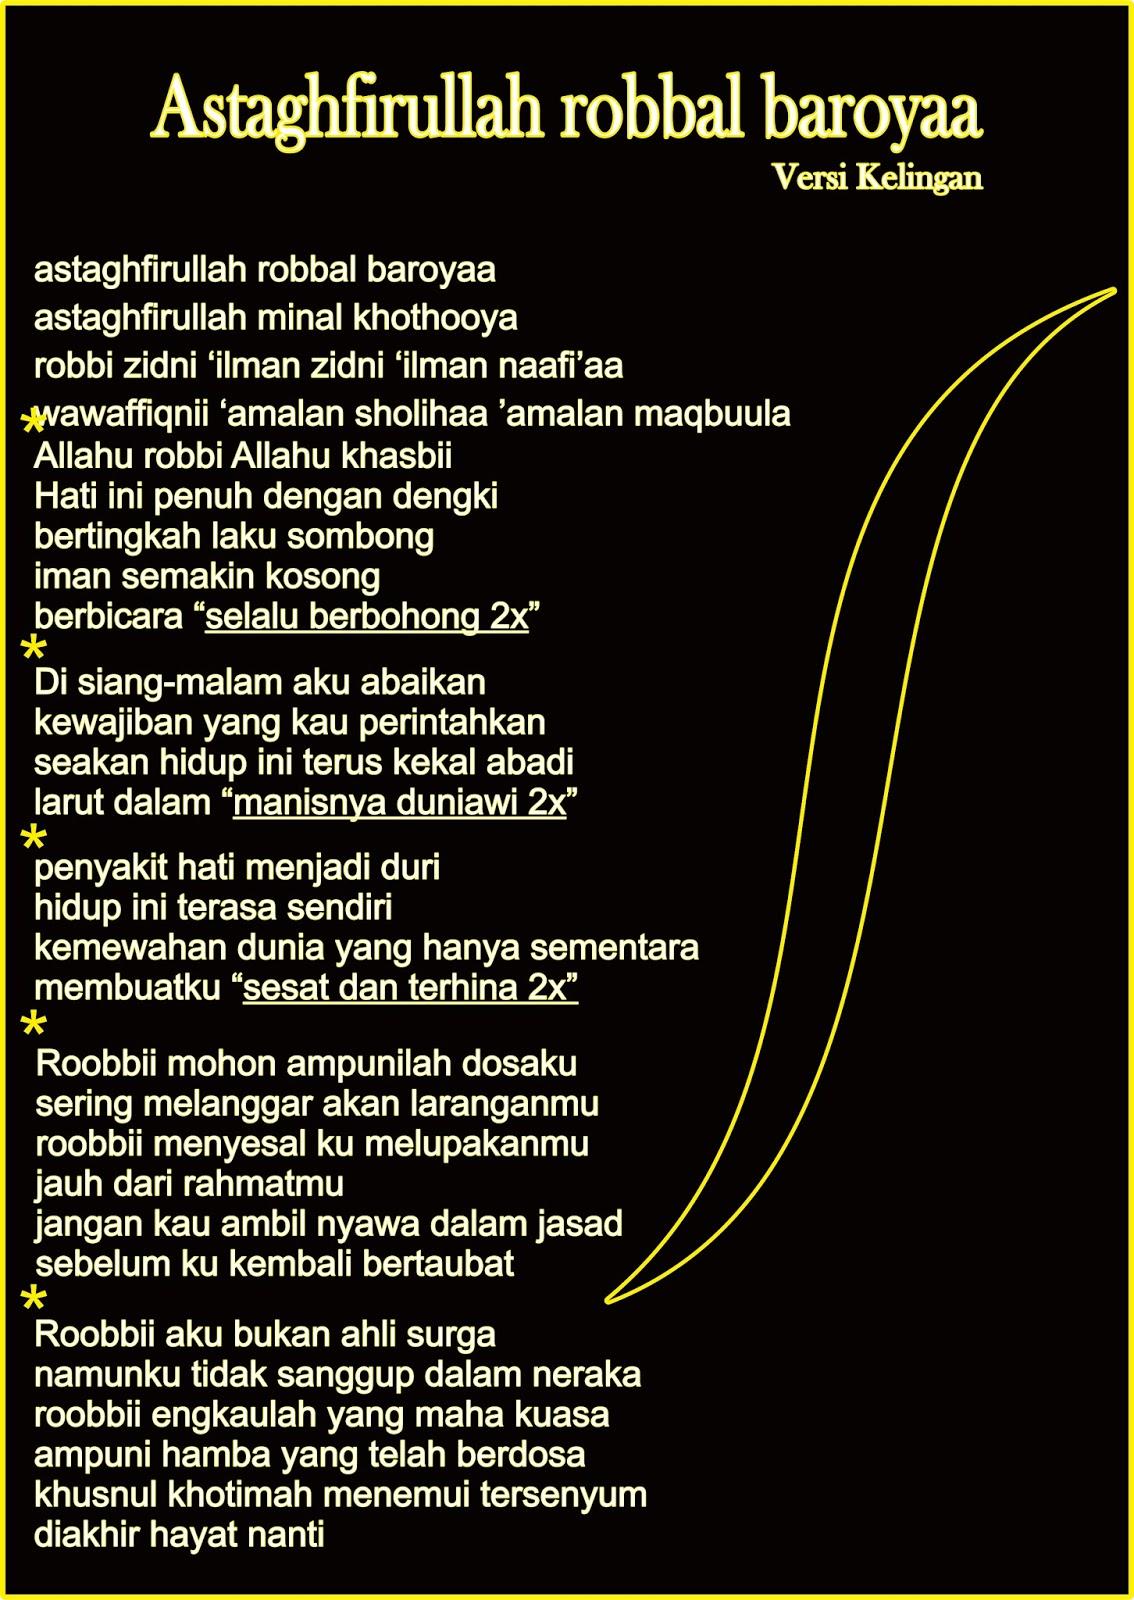 Lirik Lagu Astaghfirullah (Versi Kelangan) - Lagu Islami